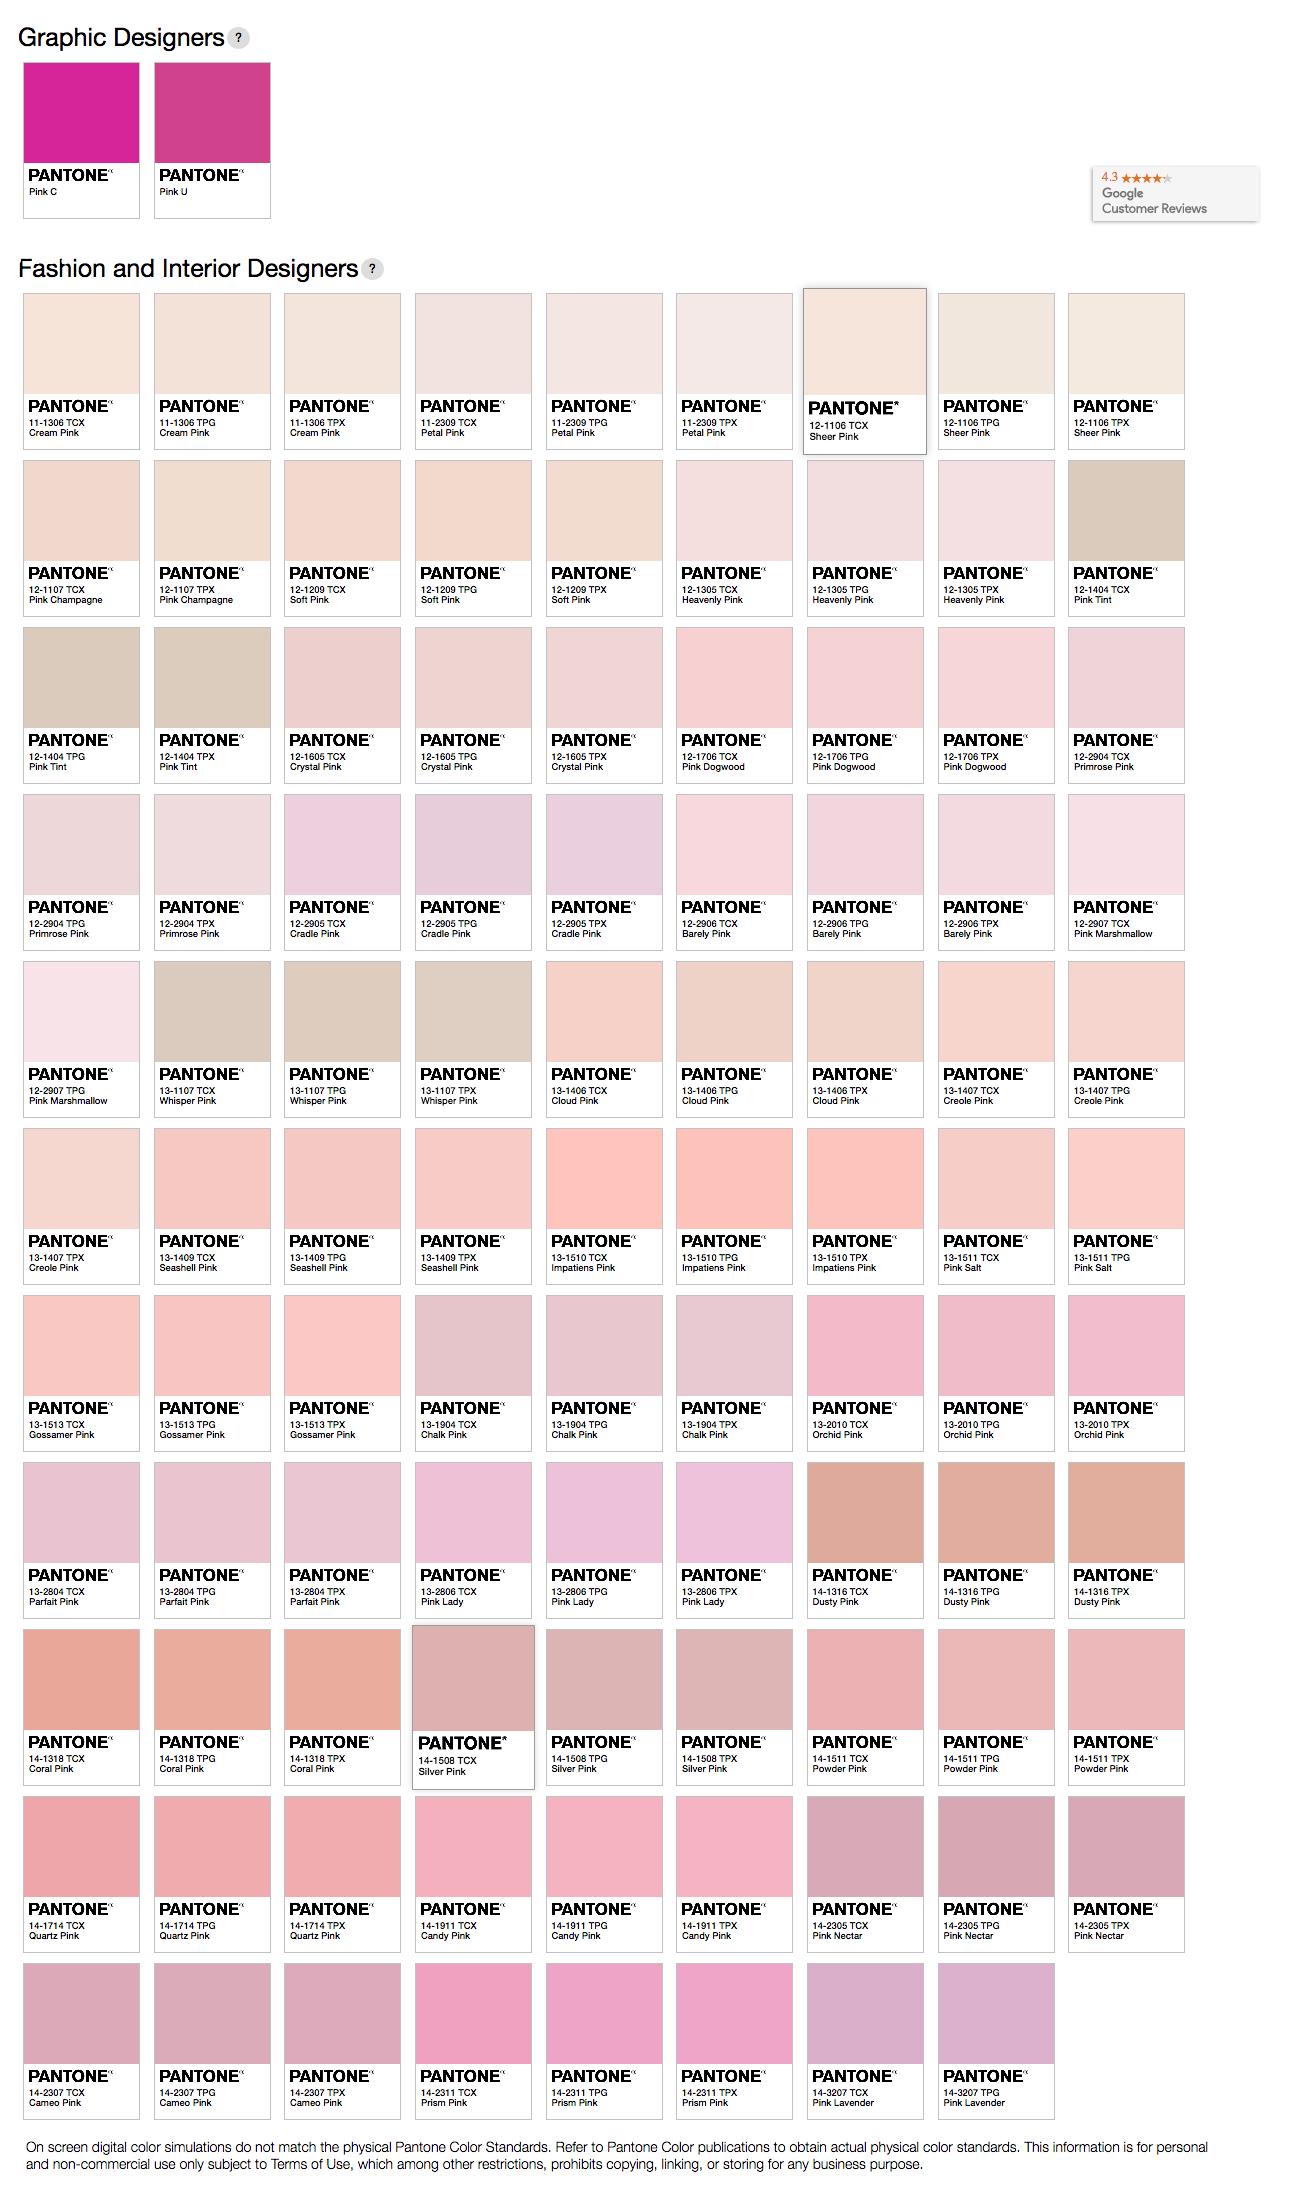 find-a-pantone-color-quick-online-color-tool.png